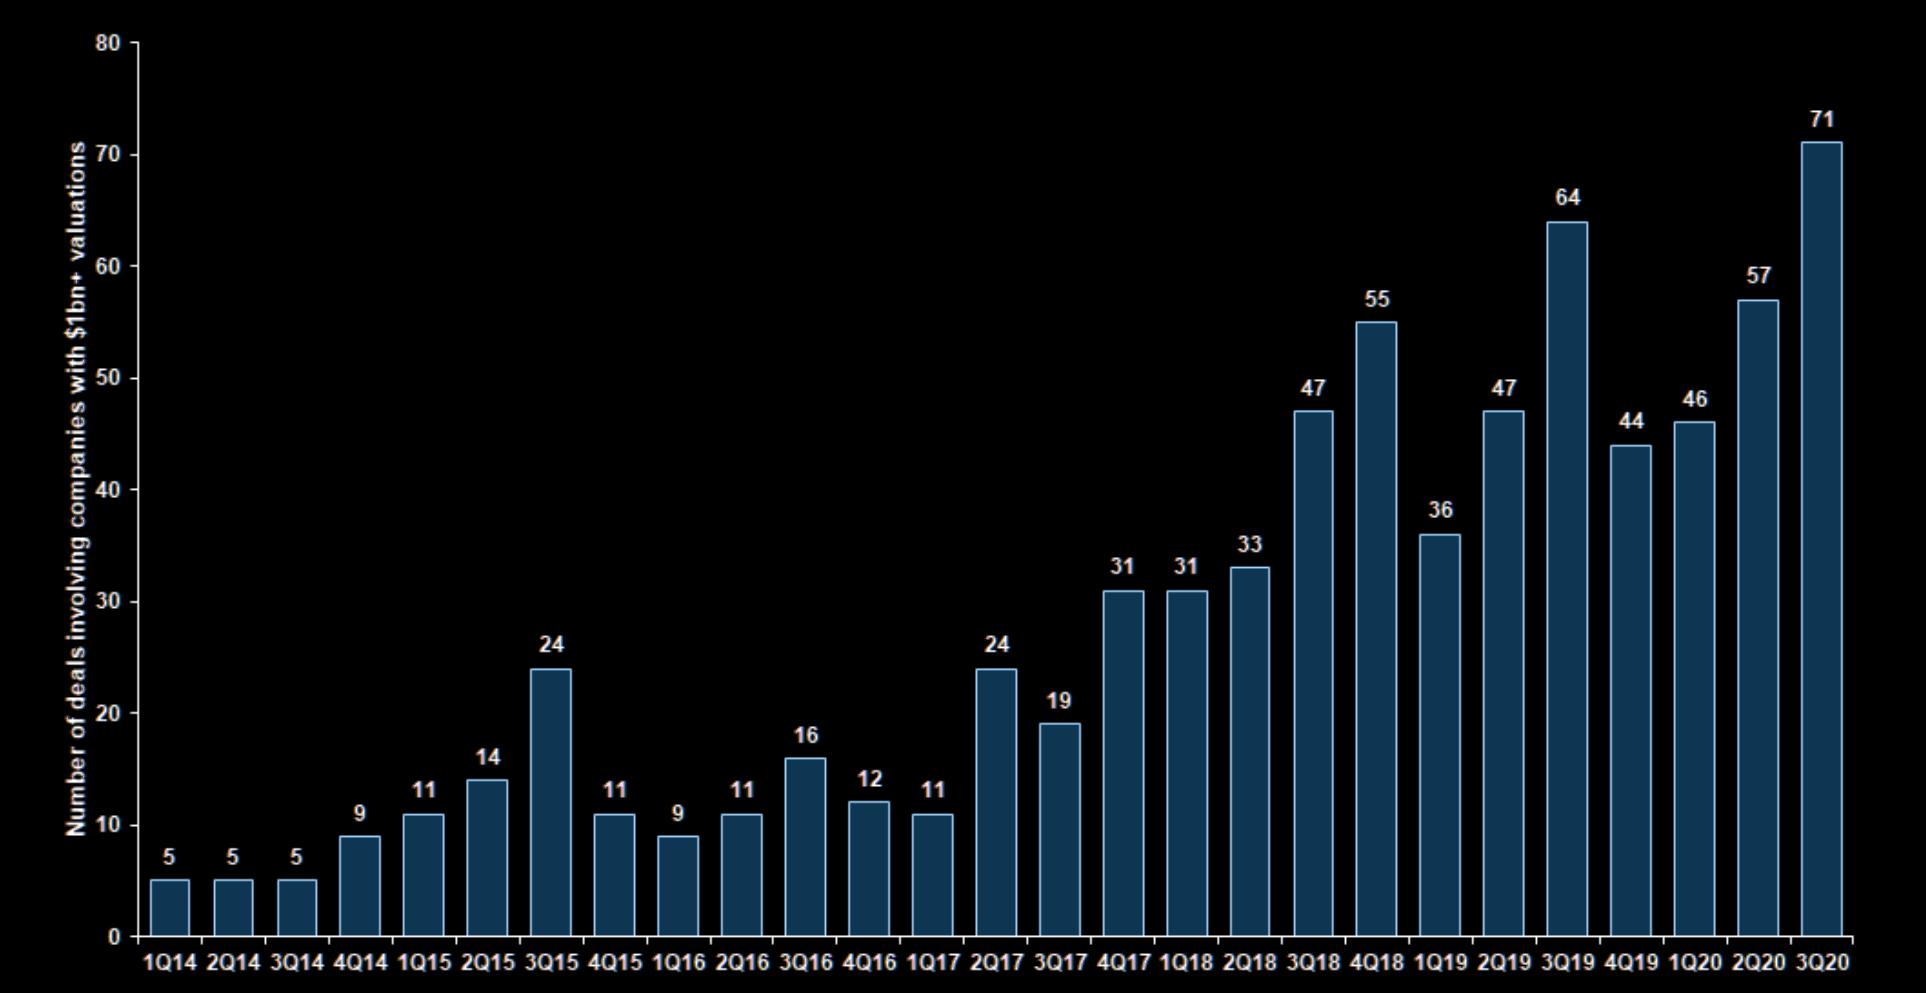 Number of funding deals per quarter